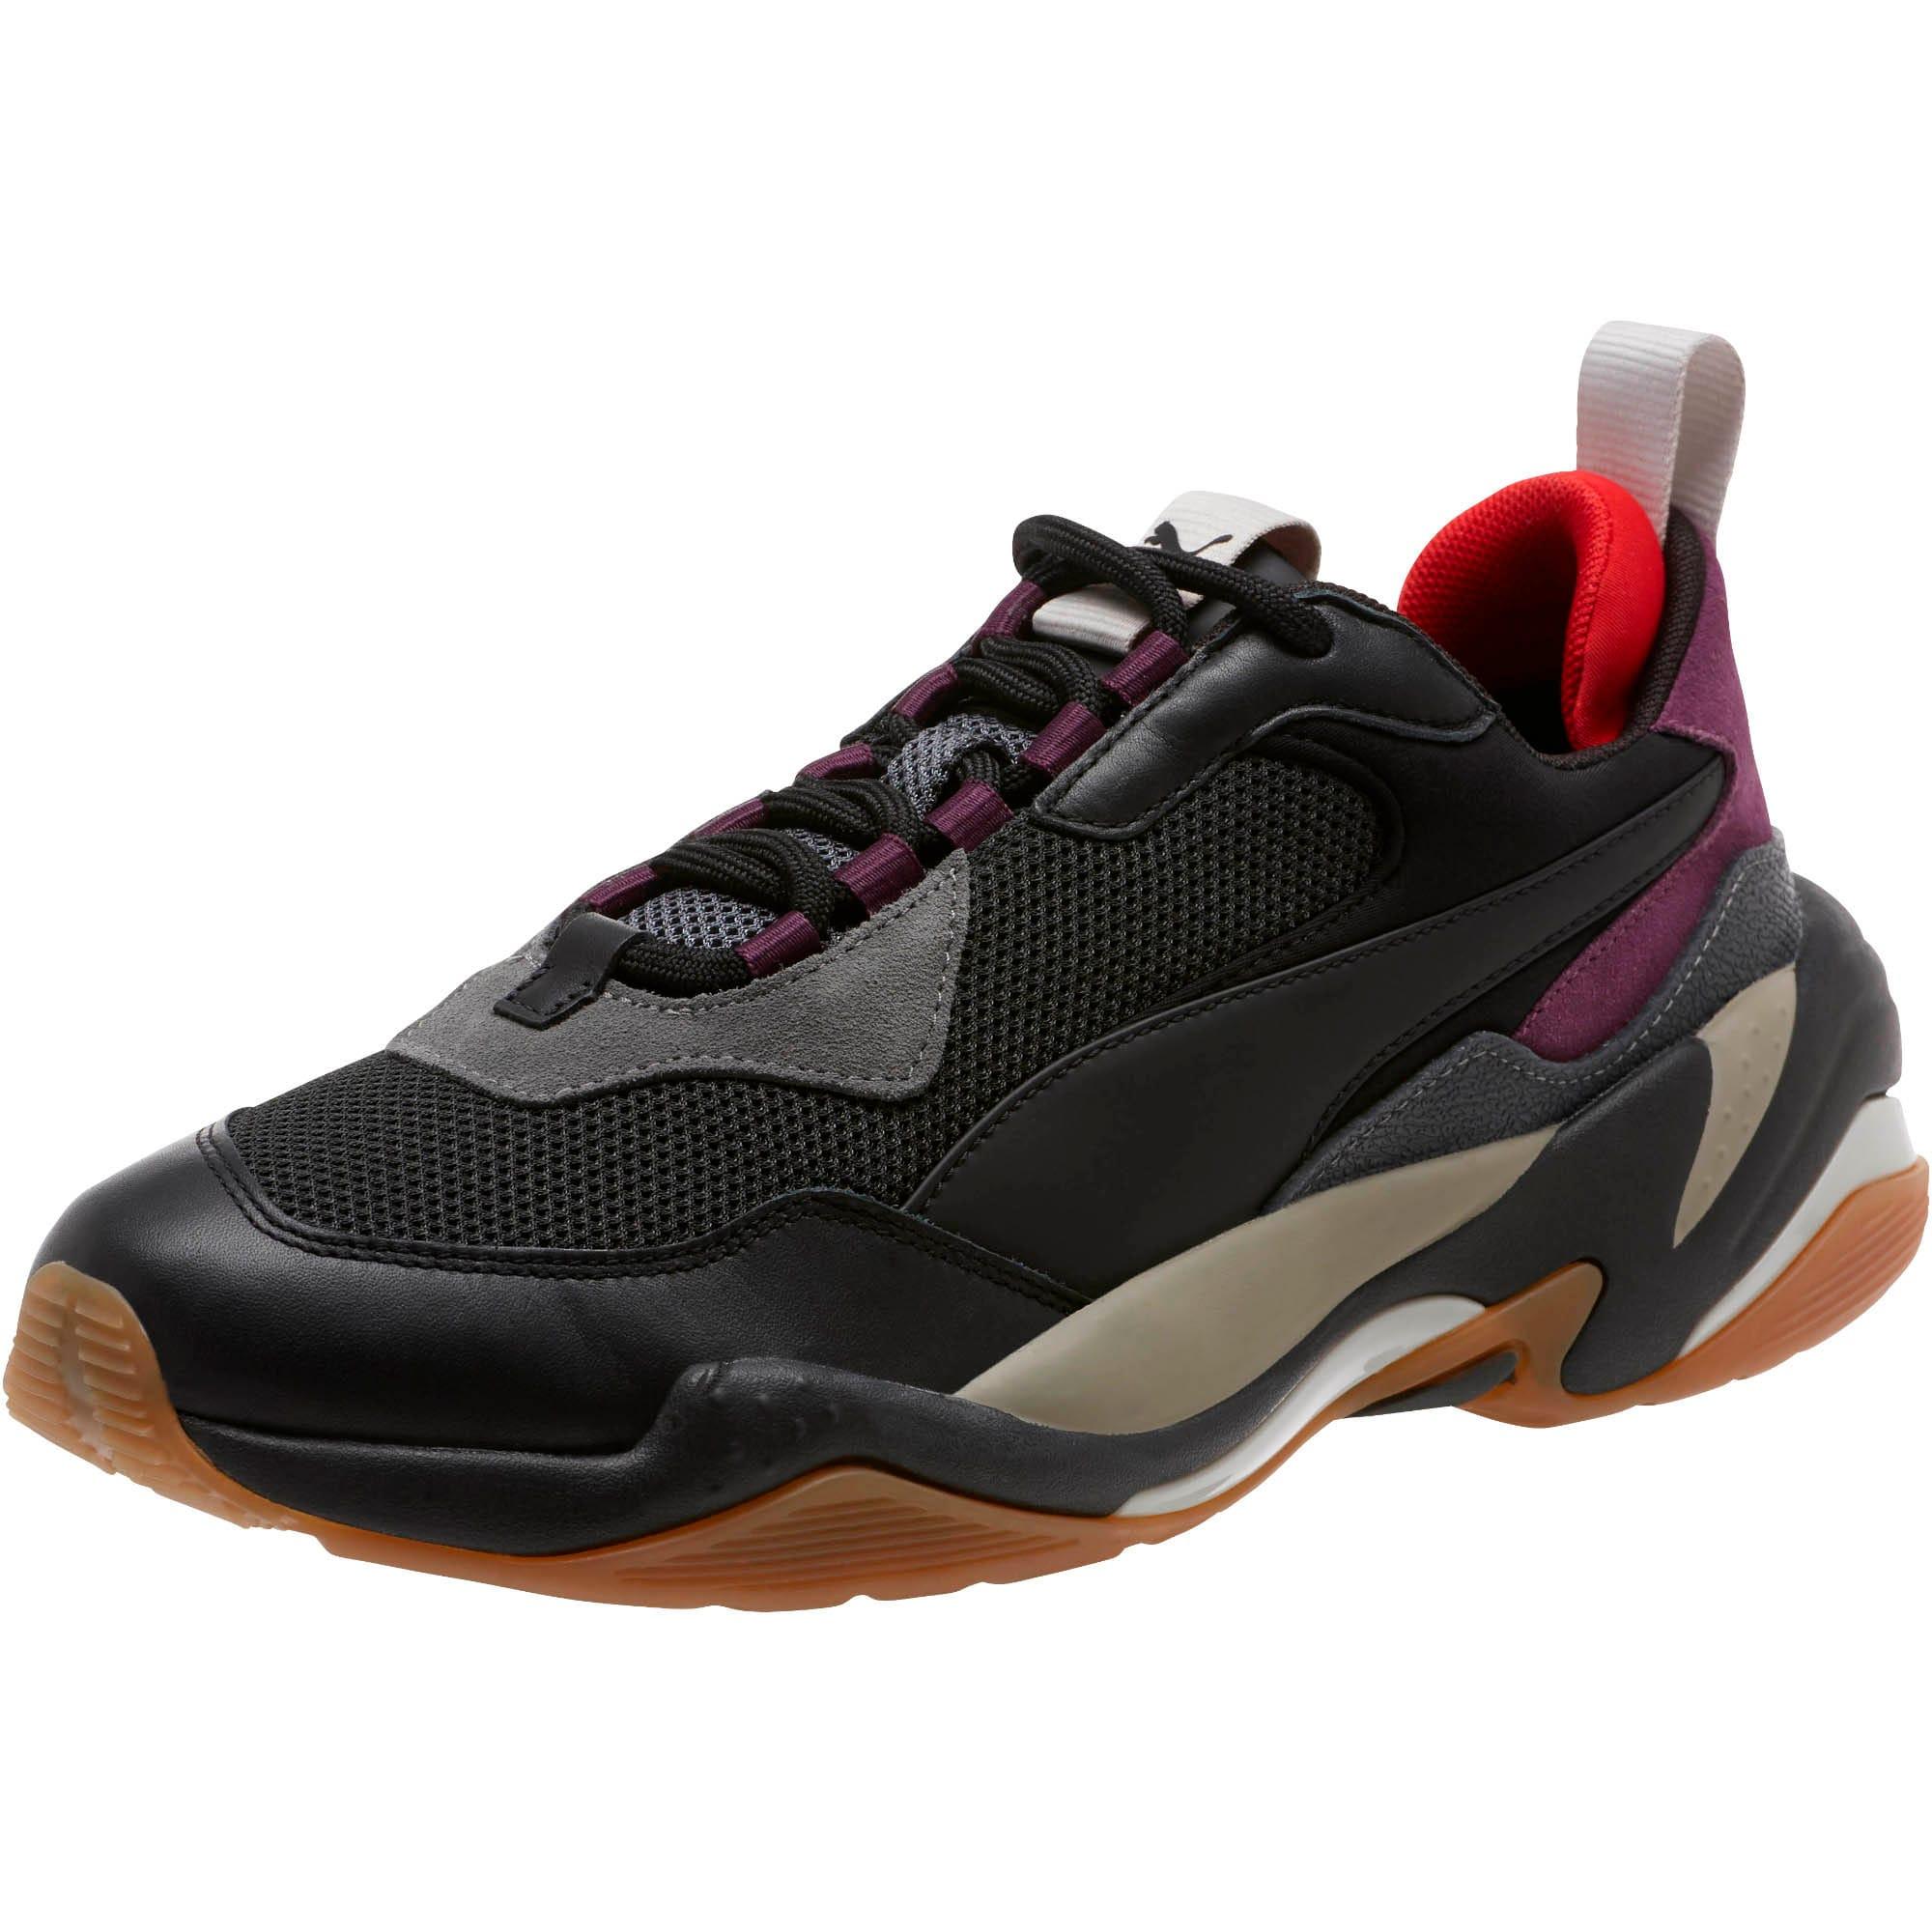 Thumbnail 1 of Thunder Spectra Sneakers, Puma Black, medium